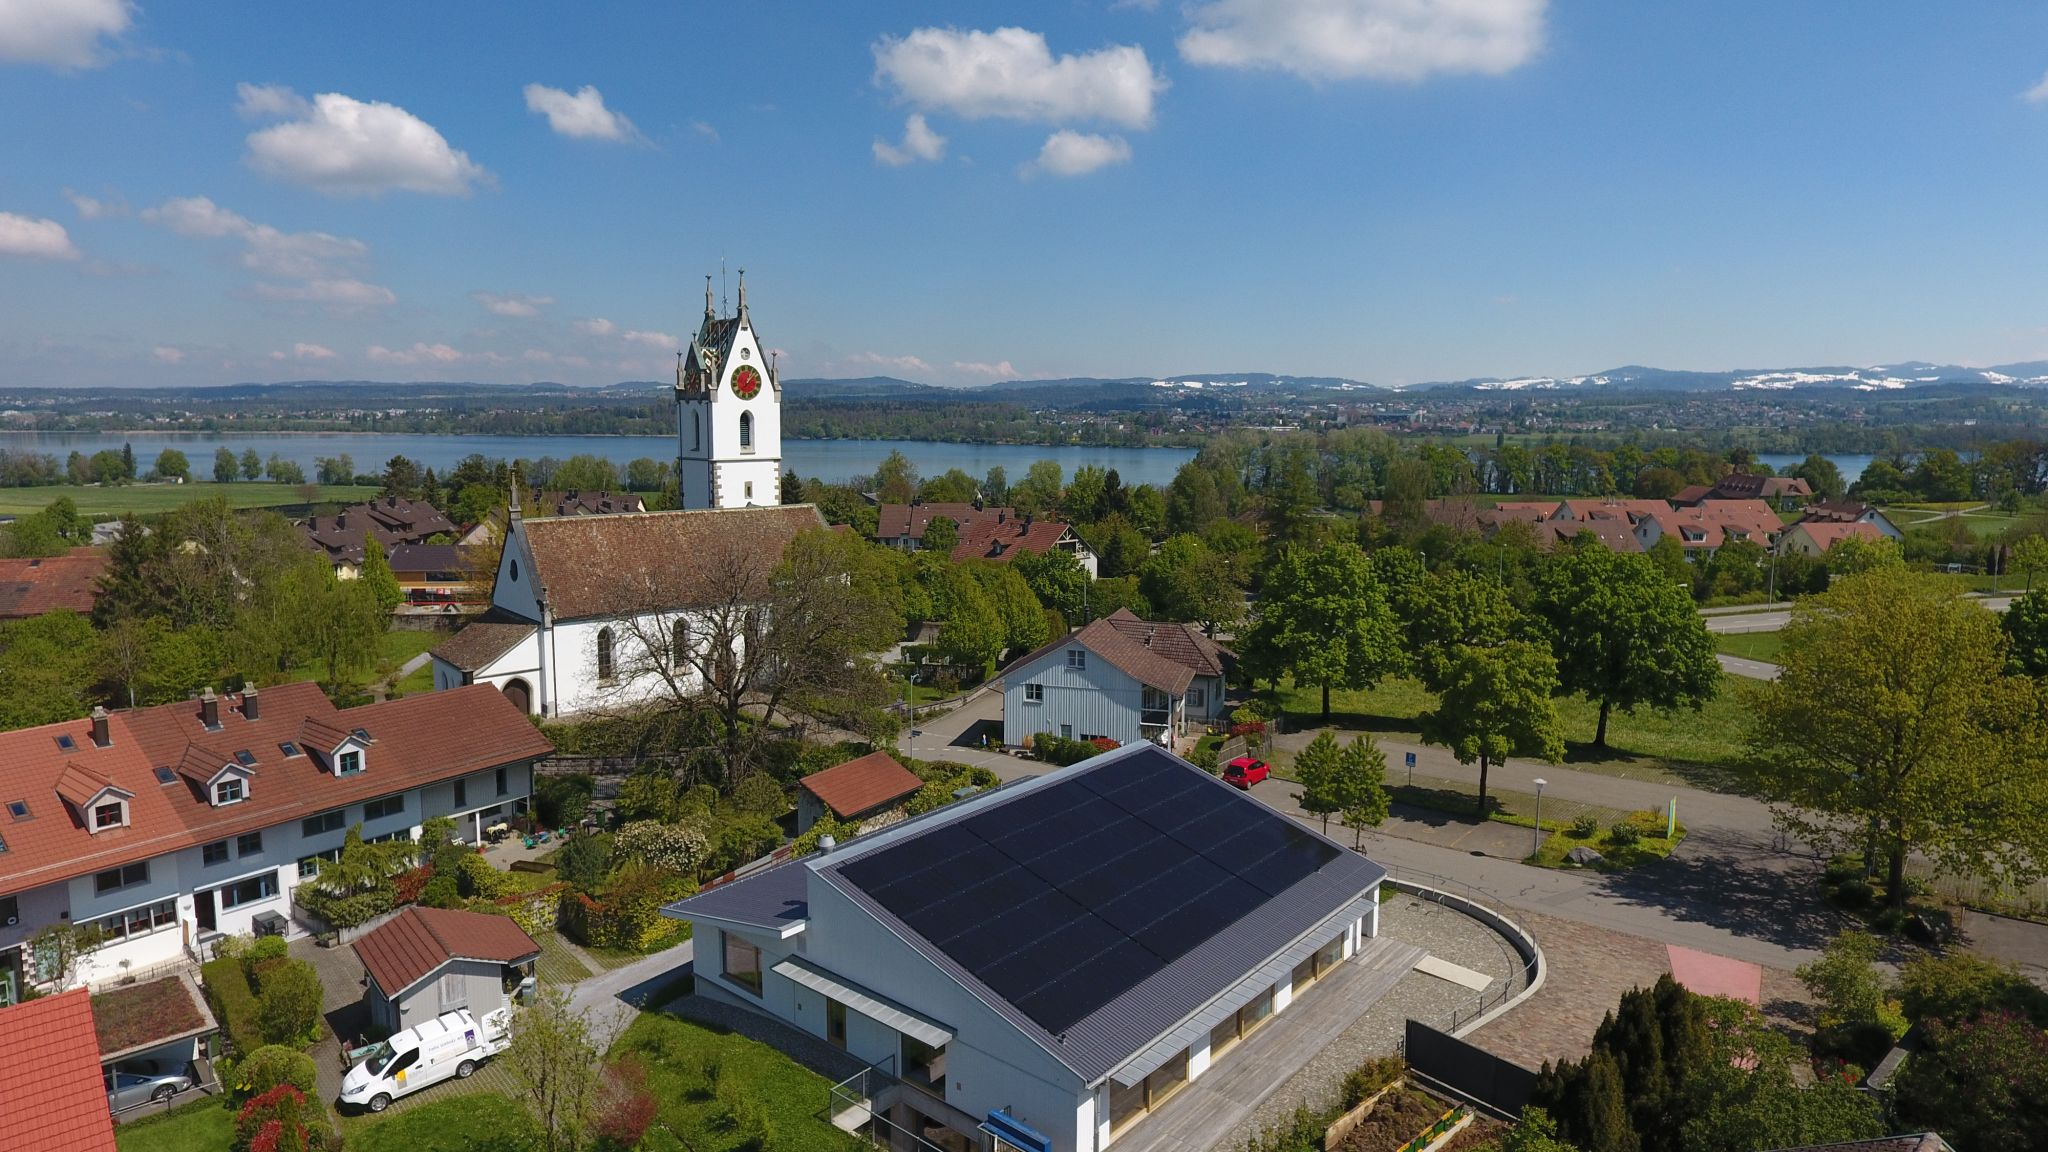 Luftaufnahme Solaranlage Kirchgemendehaus Kreuzbühl